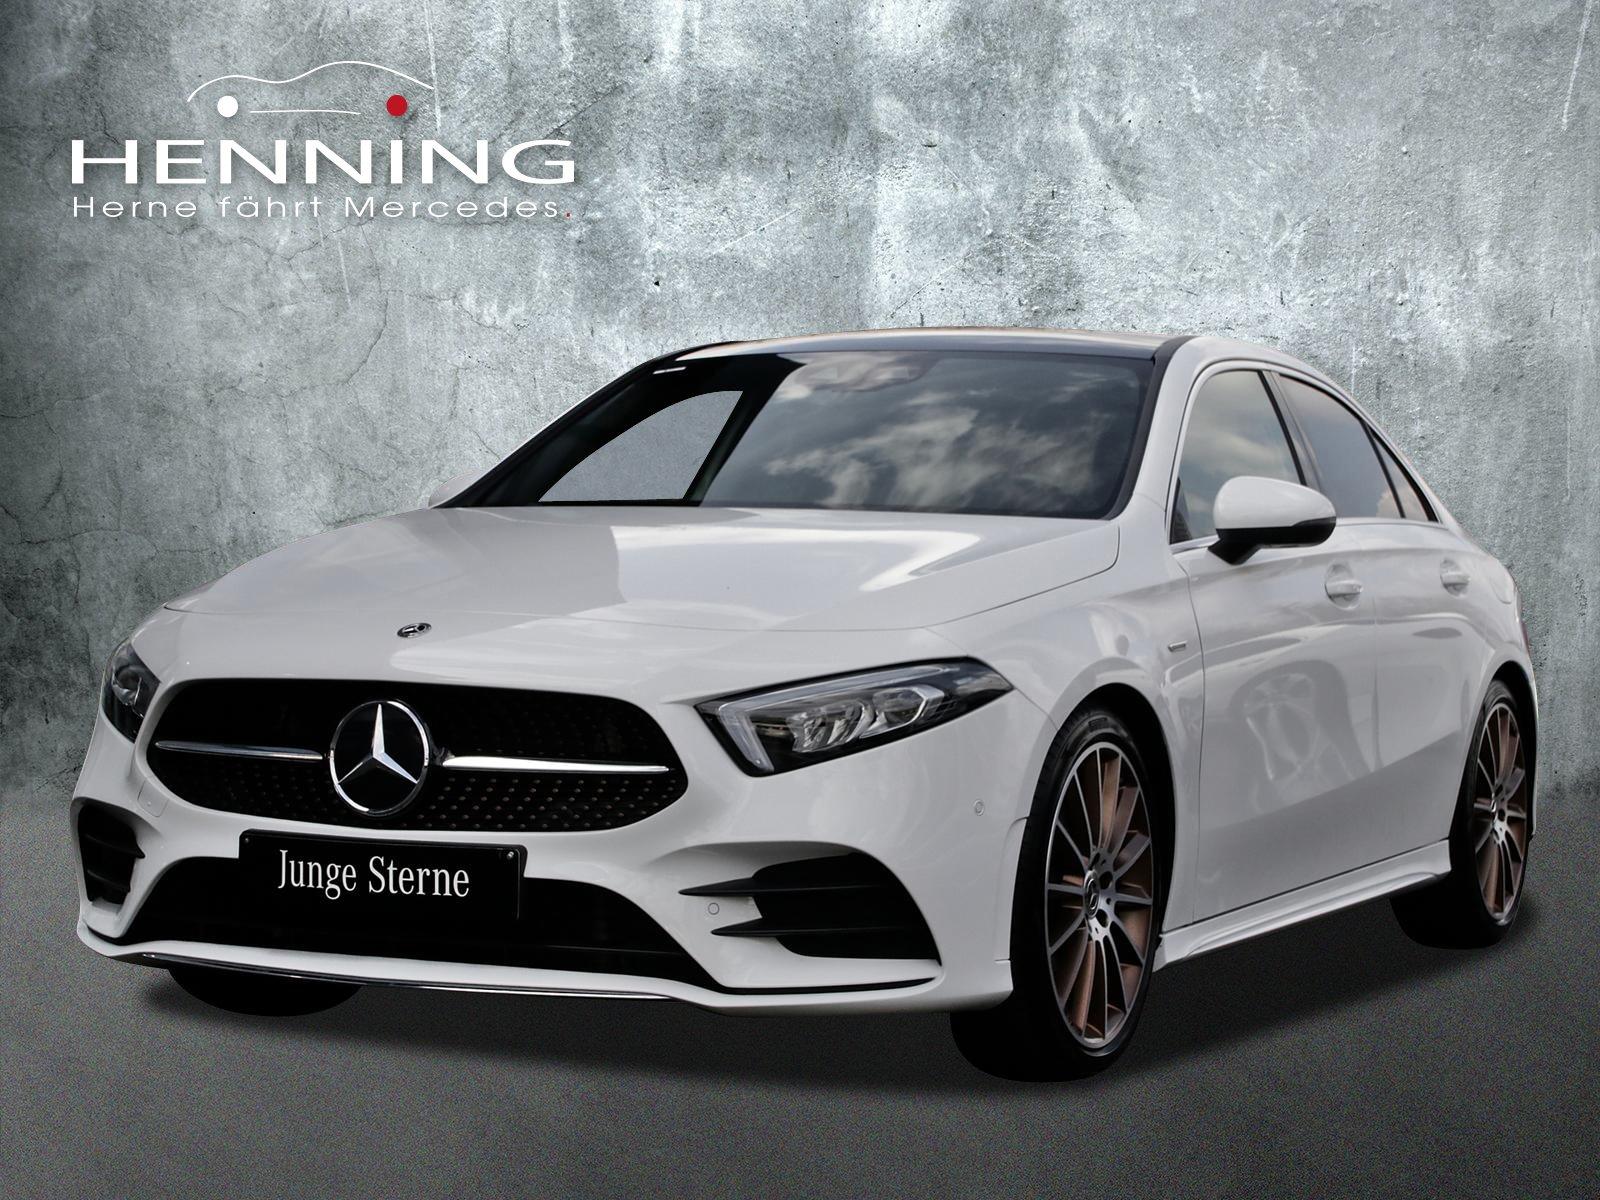 Mercedes-Benz A 200 Edition 1 Pano Navi MBUX-AR Ambientebel., Jahr 2019, Benzin